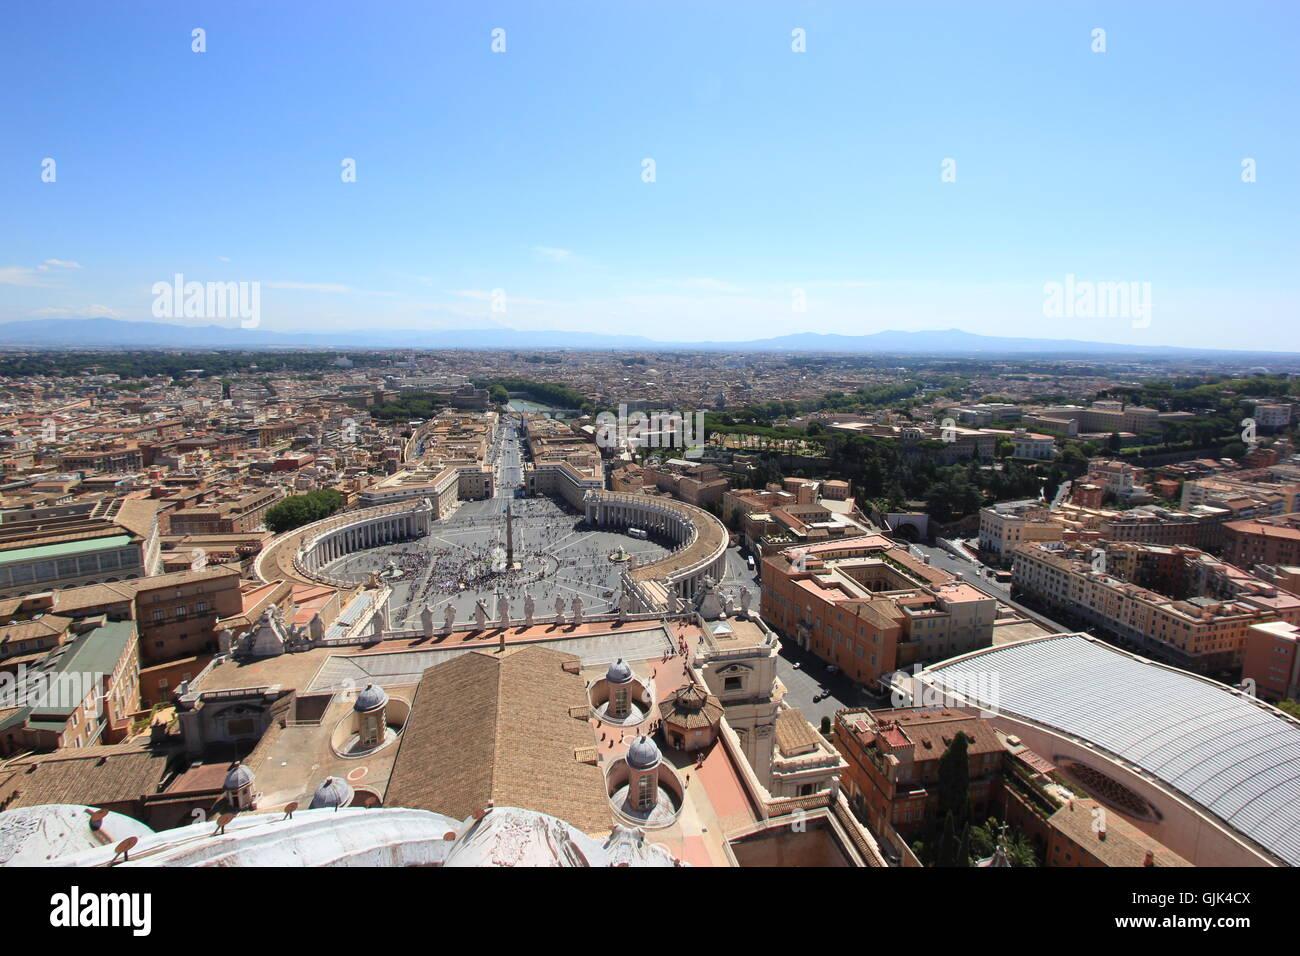 Saint Peter's Basilica, Vatican City, Rome, Italy Stock Photo